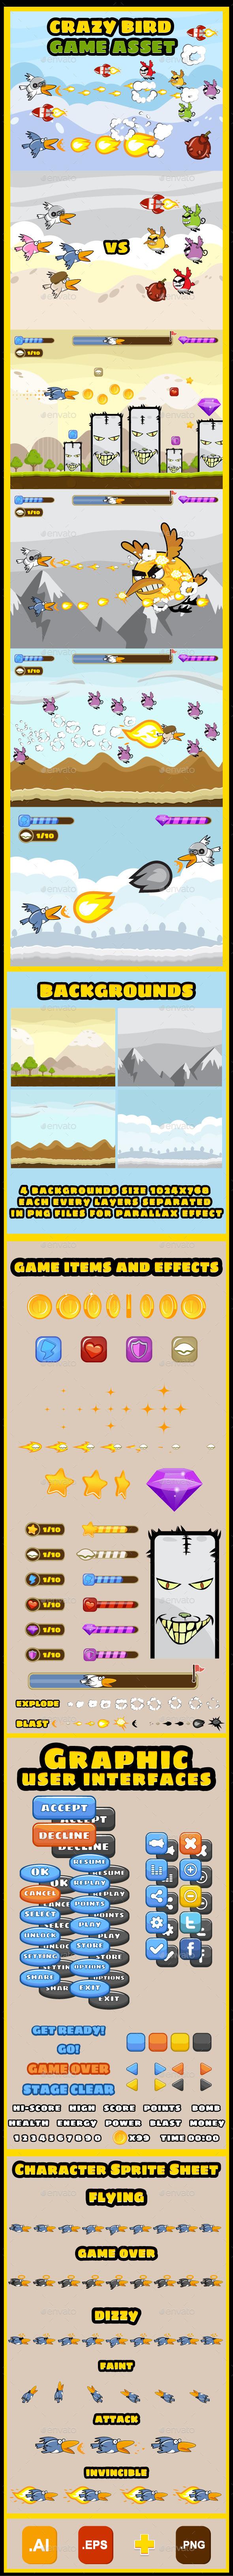 Crazy Birds Game UI Kit  - Game Kits Game Assets